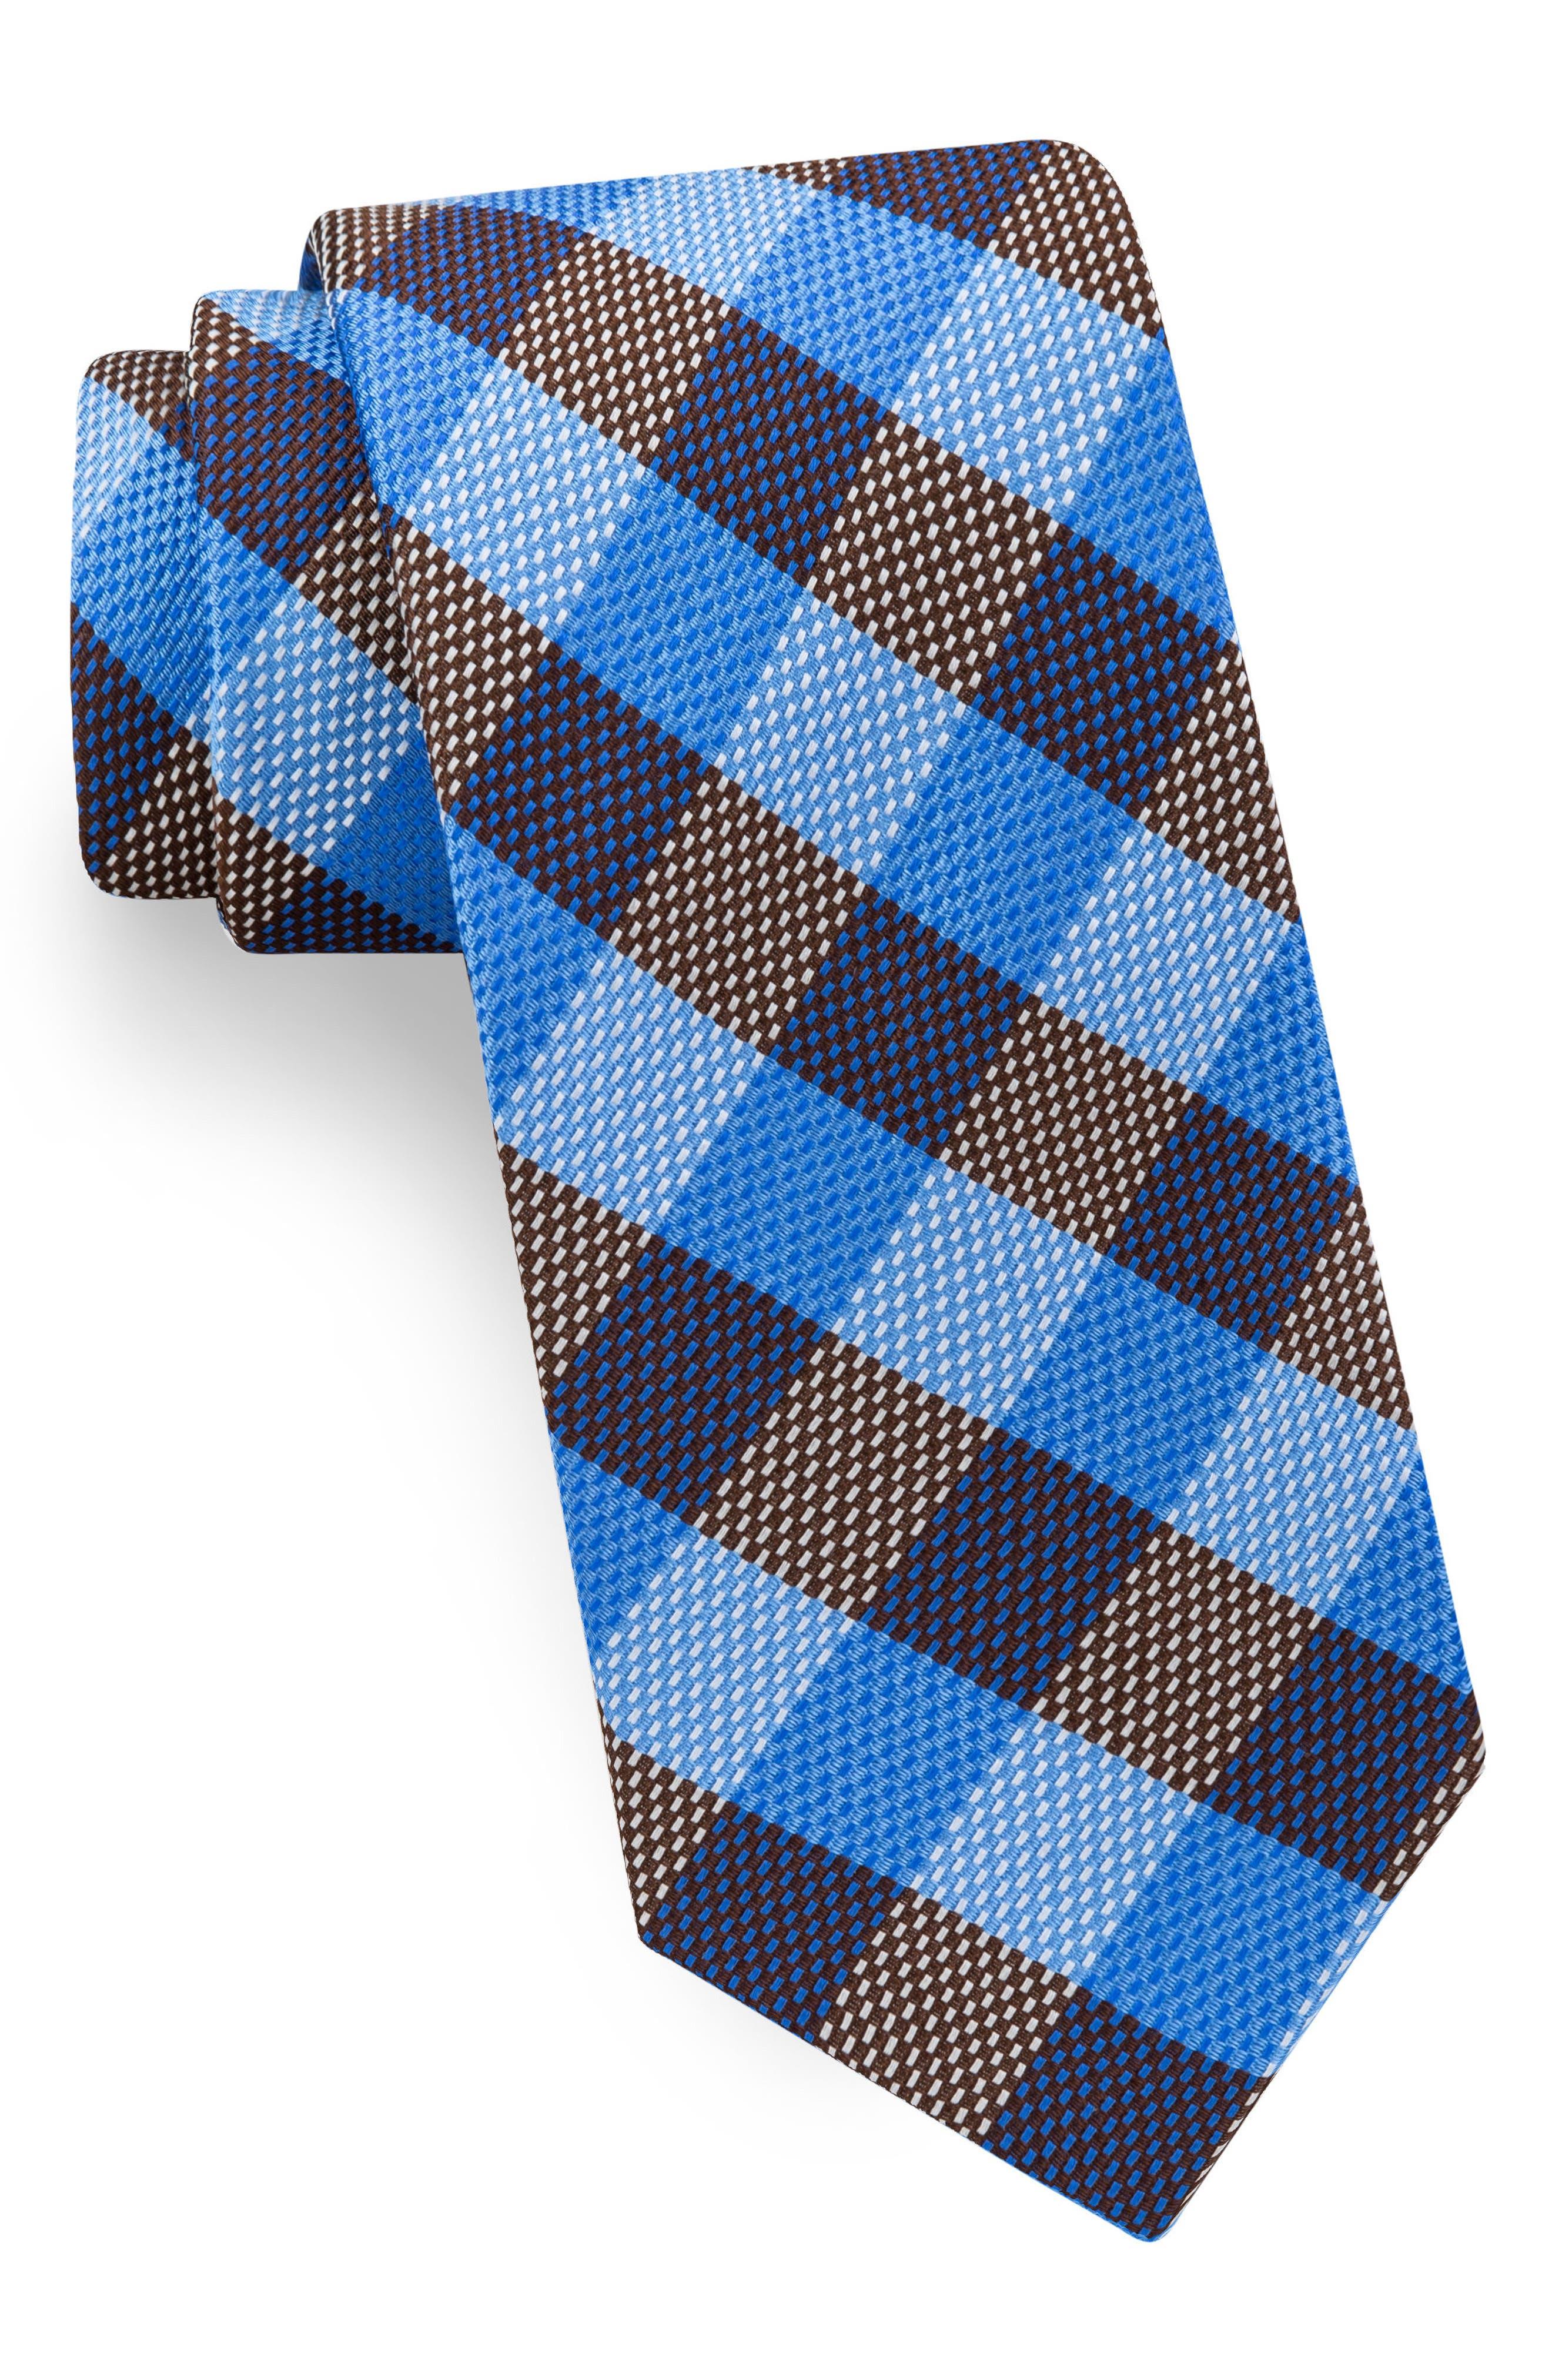 Derby Check Silk Tie,                             Main thumbnail 1, color,                             401